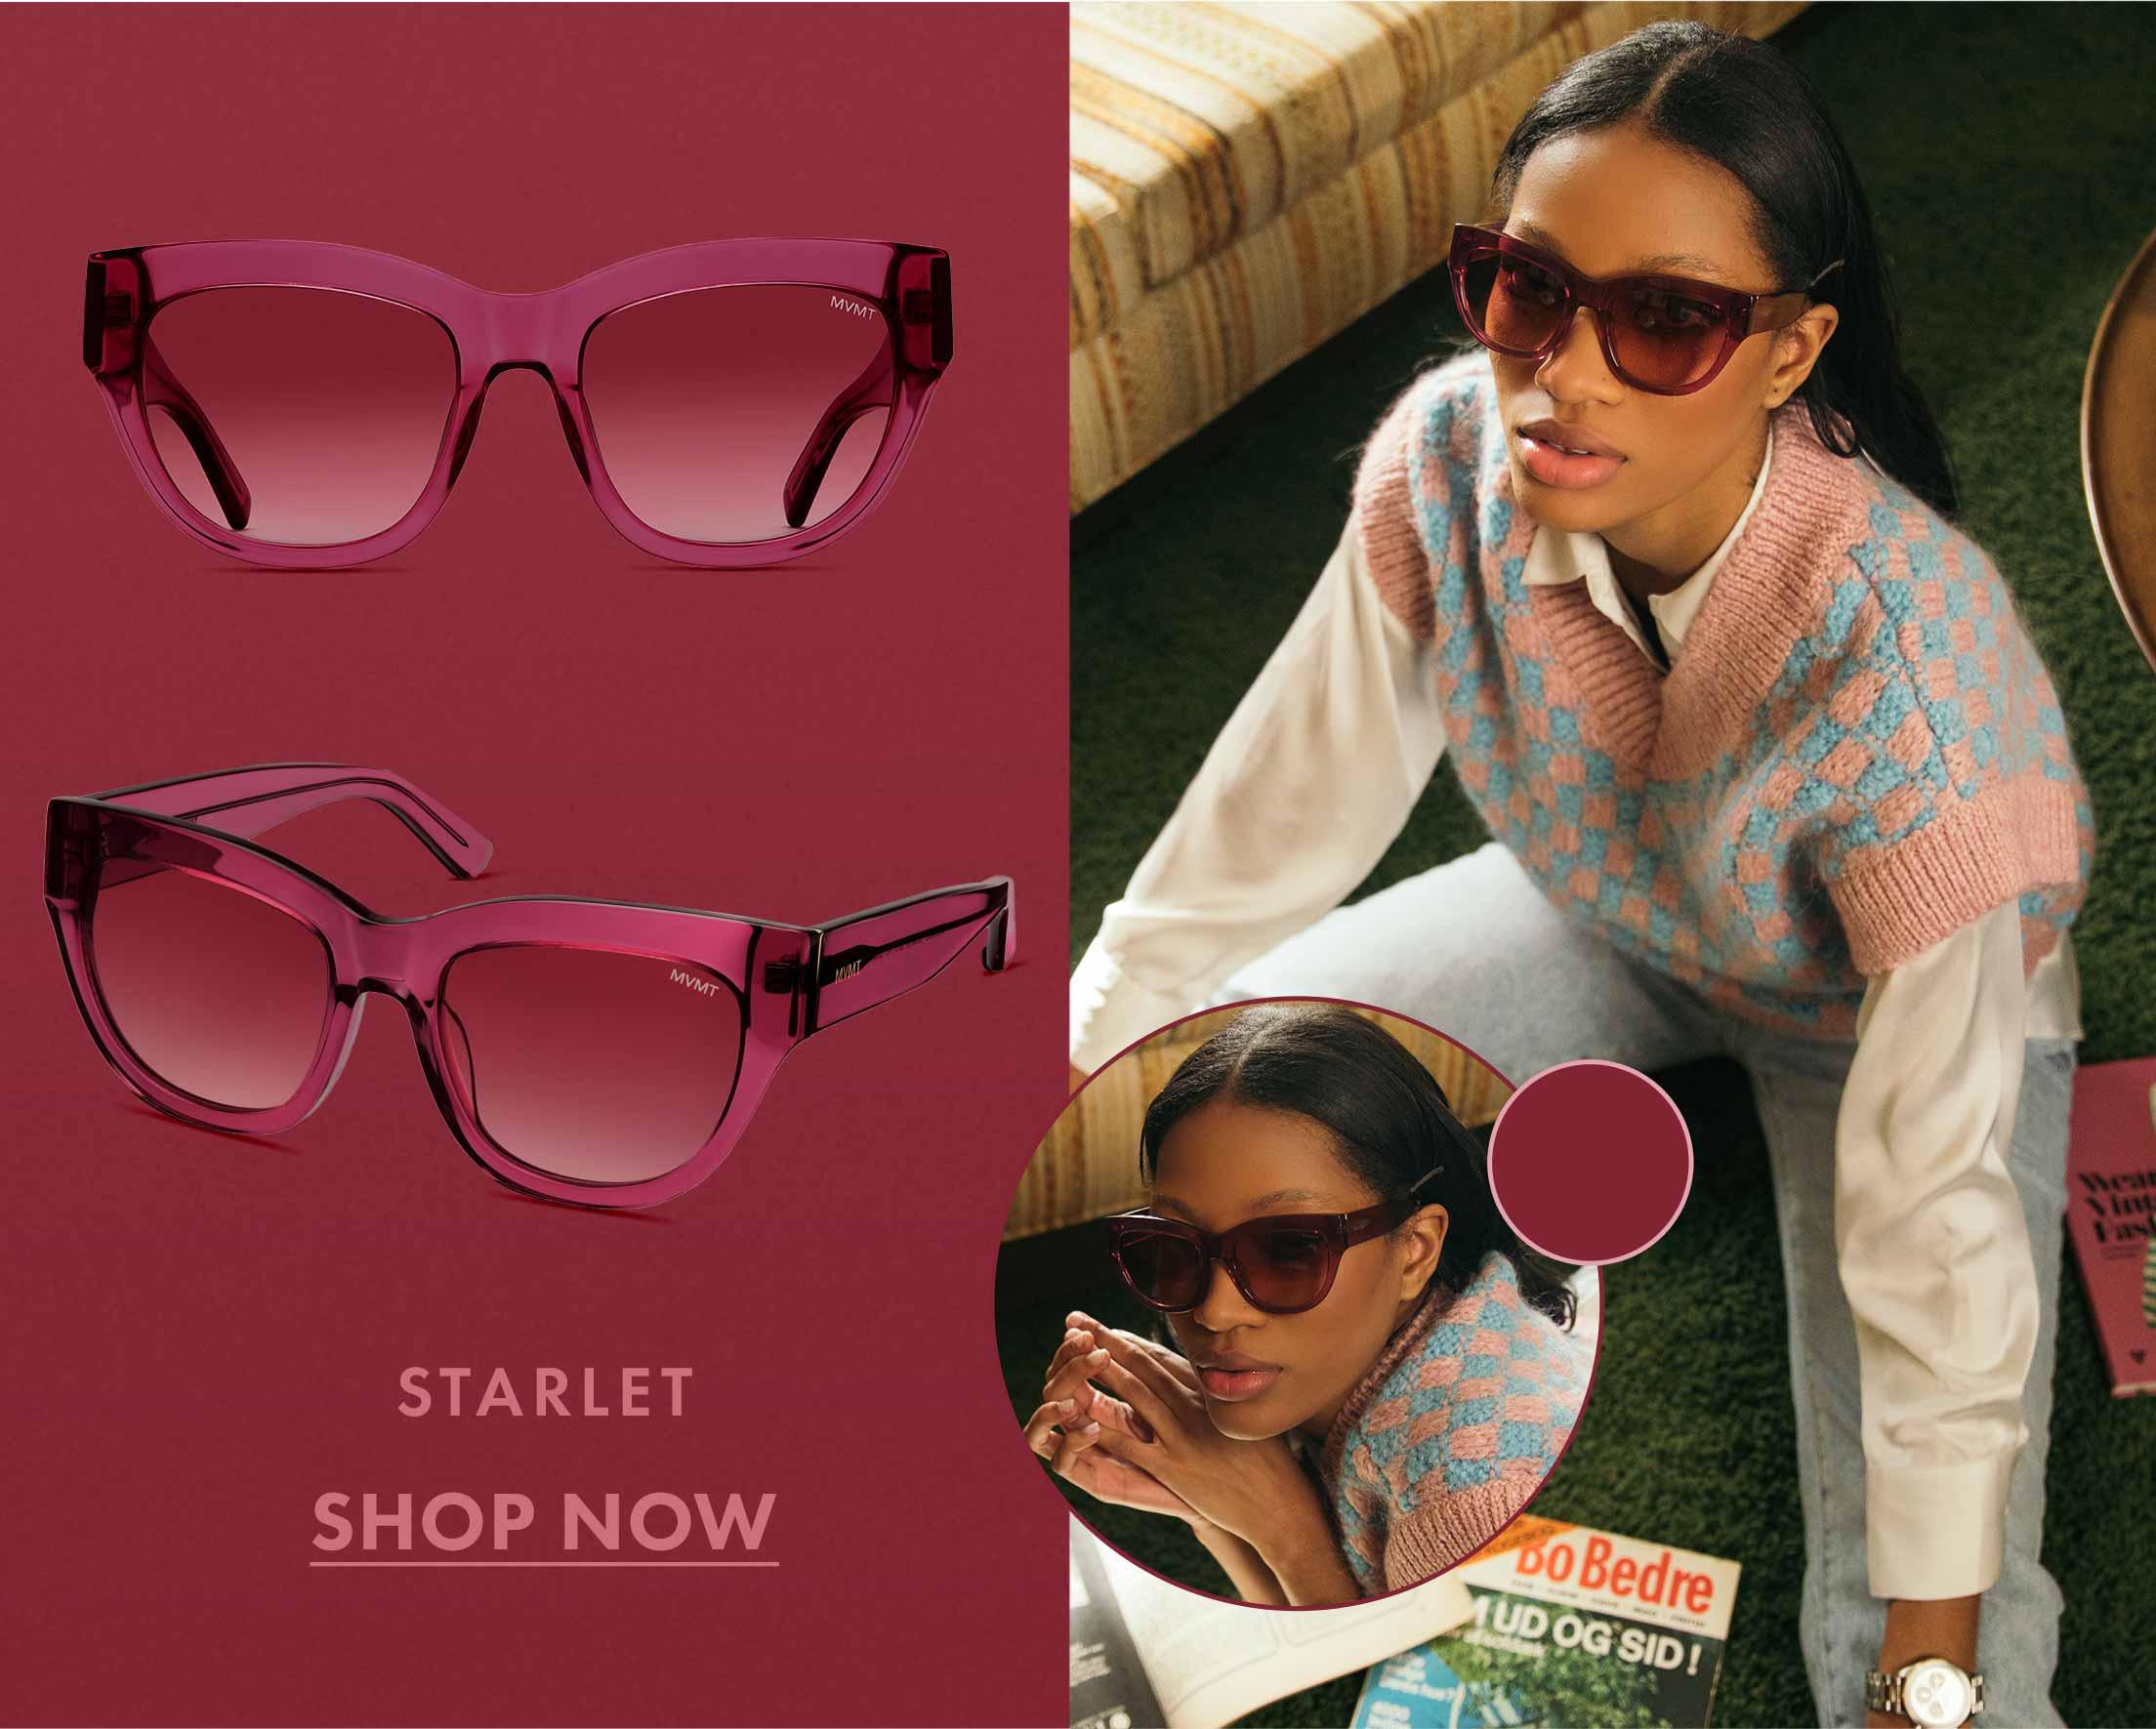 Starlet: Shop Now